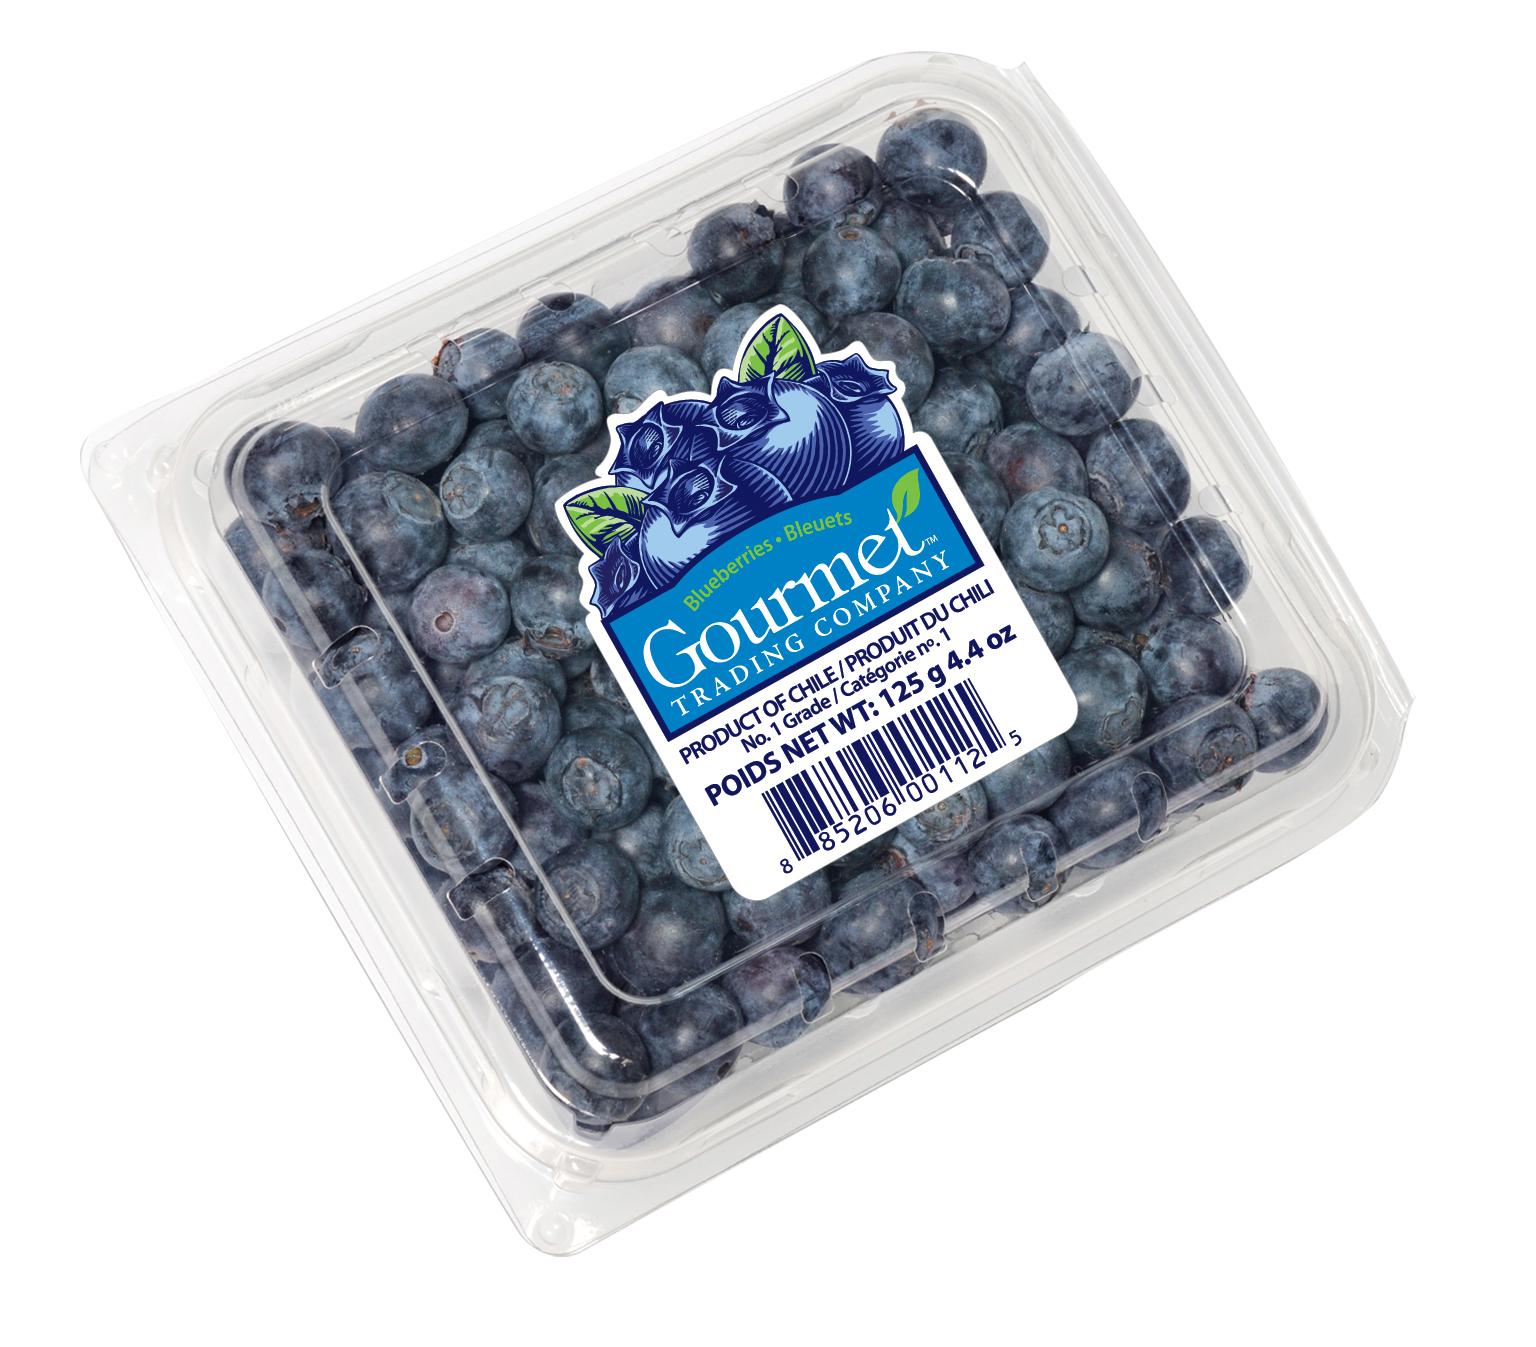 Chile Blueberry Season Begins